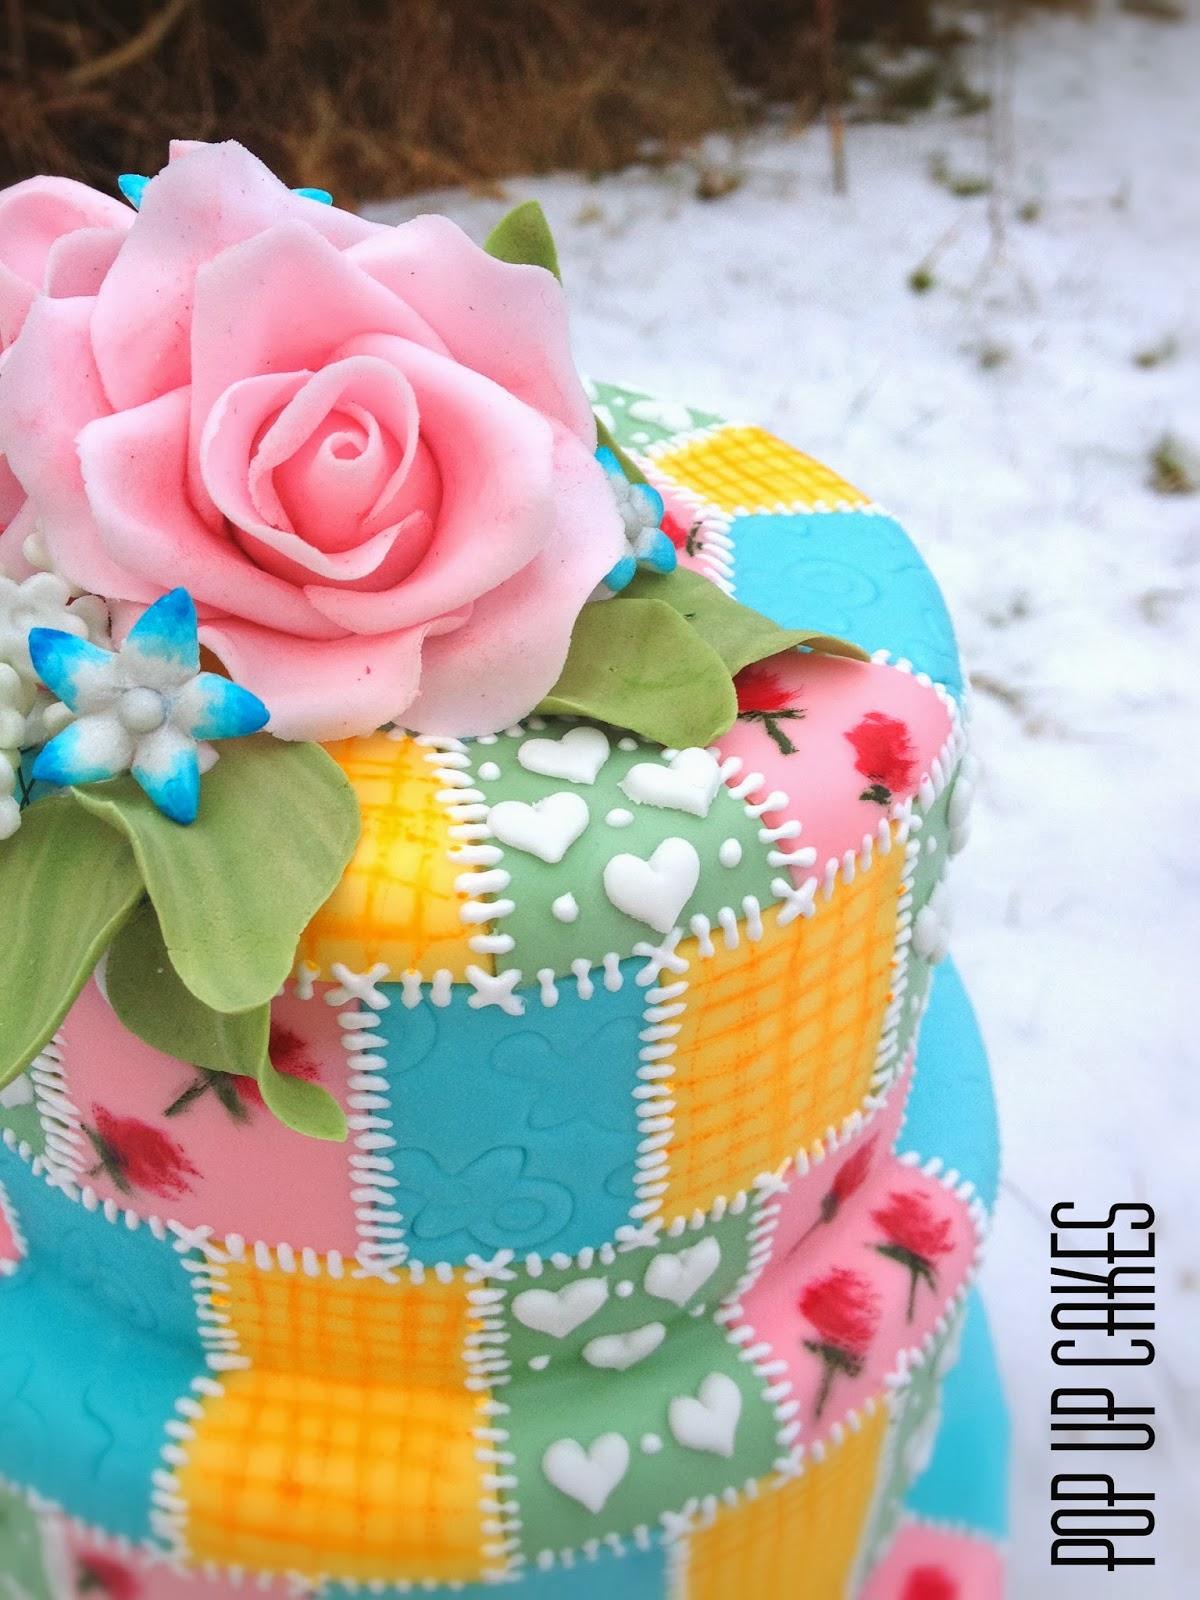 Pop up Cakes: Baby-Quilt Cake. : baby quilt cake - Adamdwight.com